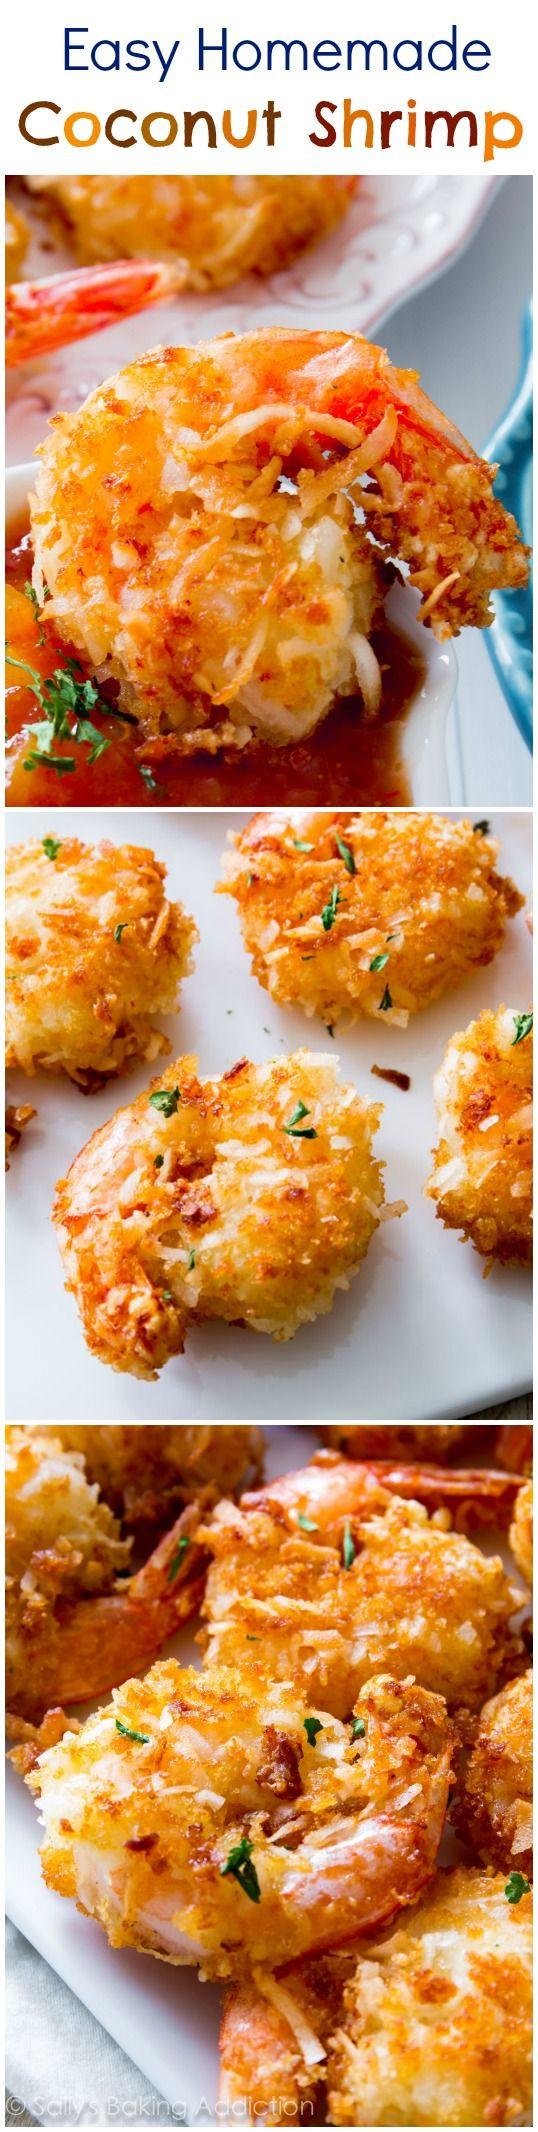 Coconut Shrimp Recipes  Coconut Shrimp I Recipes — Dishmaps